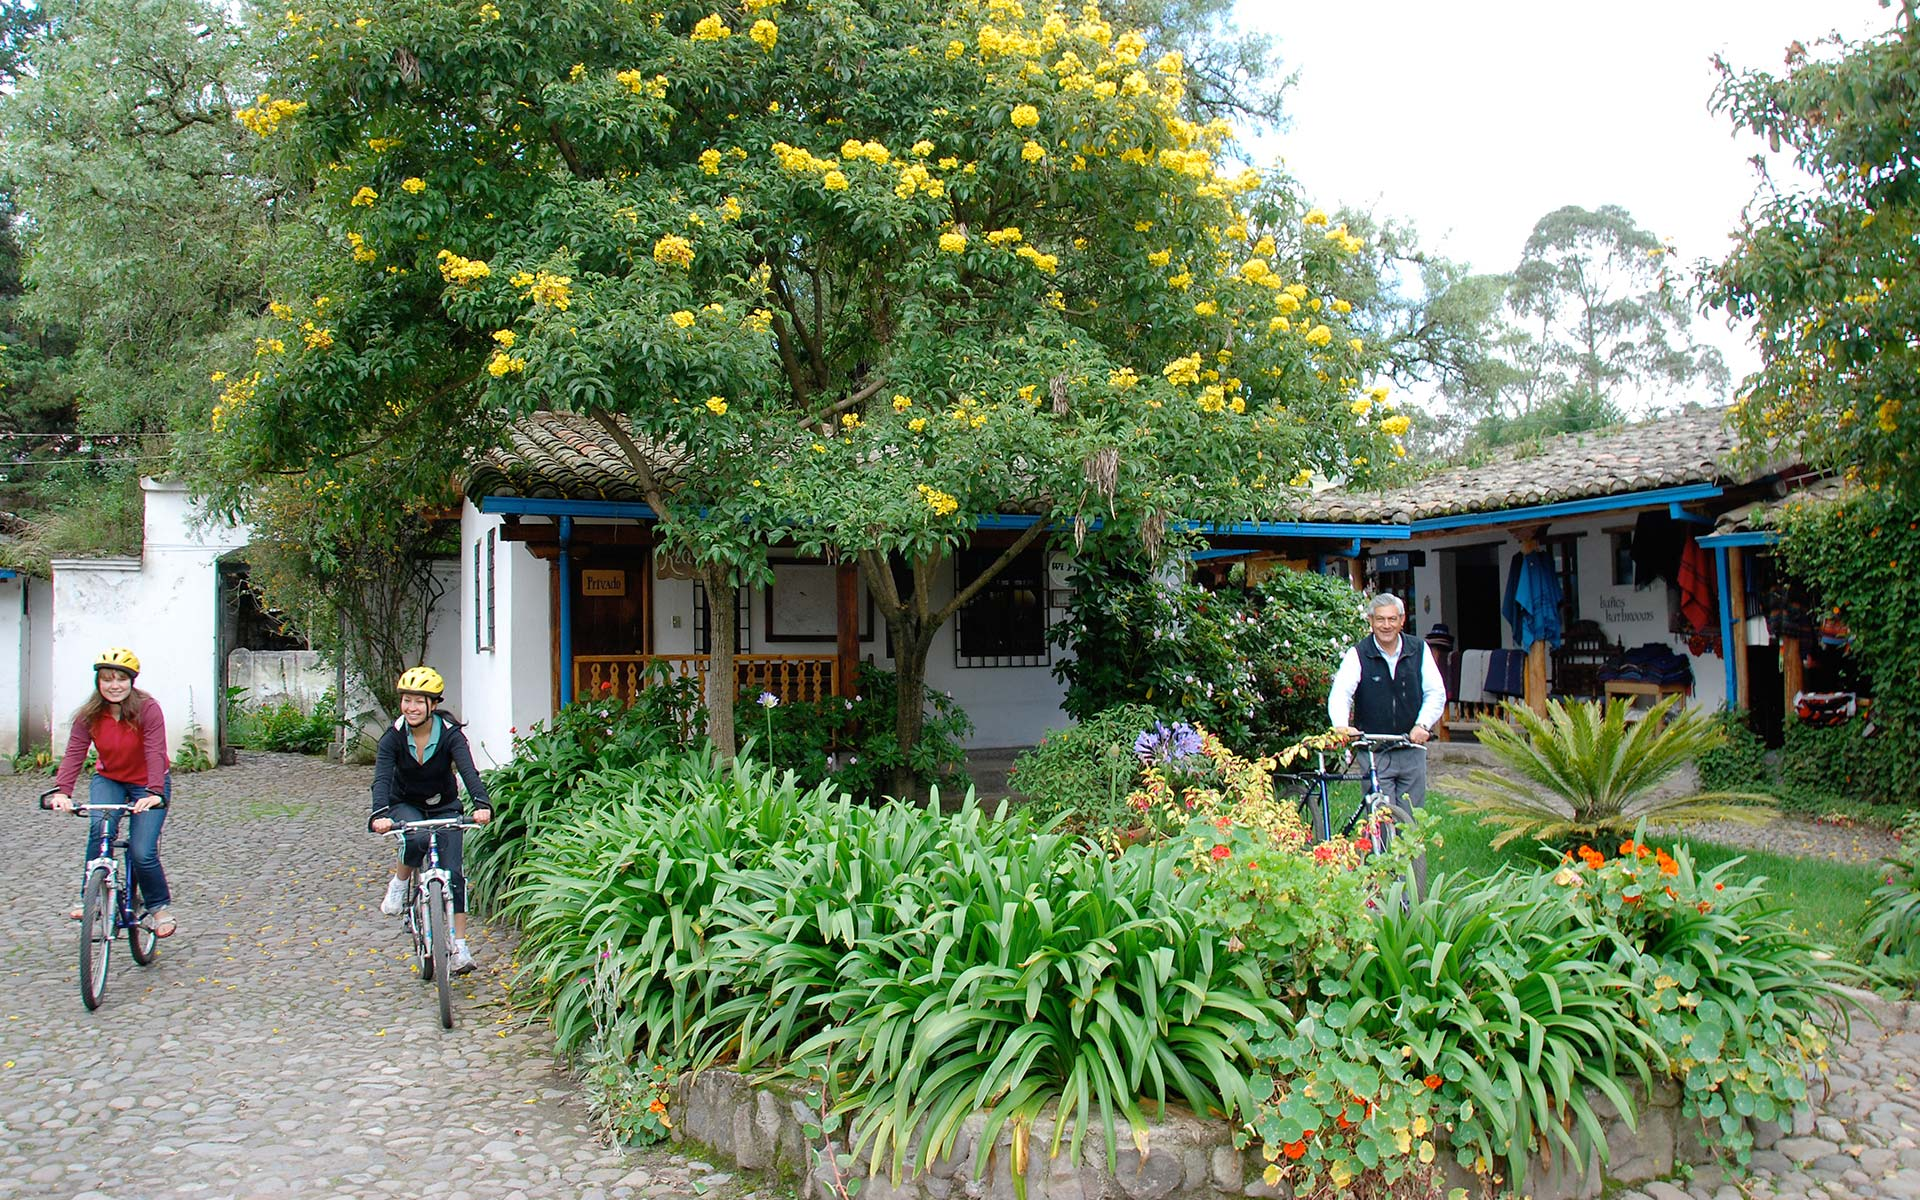 hacienda cusin activities